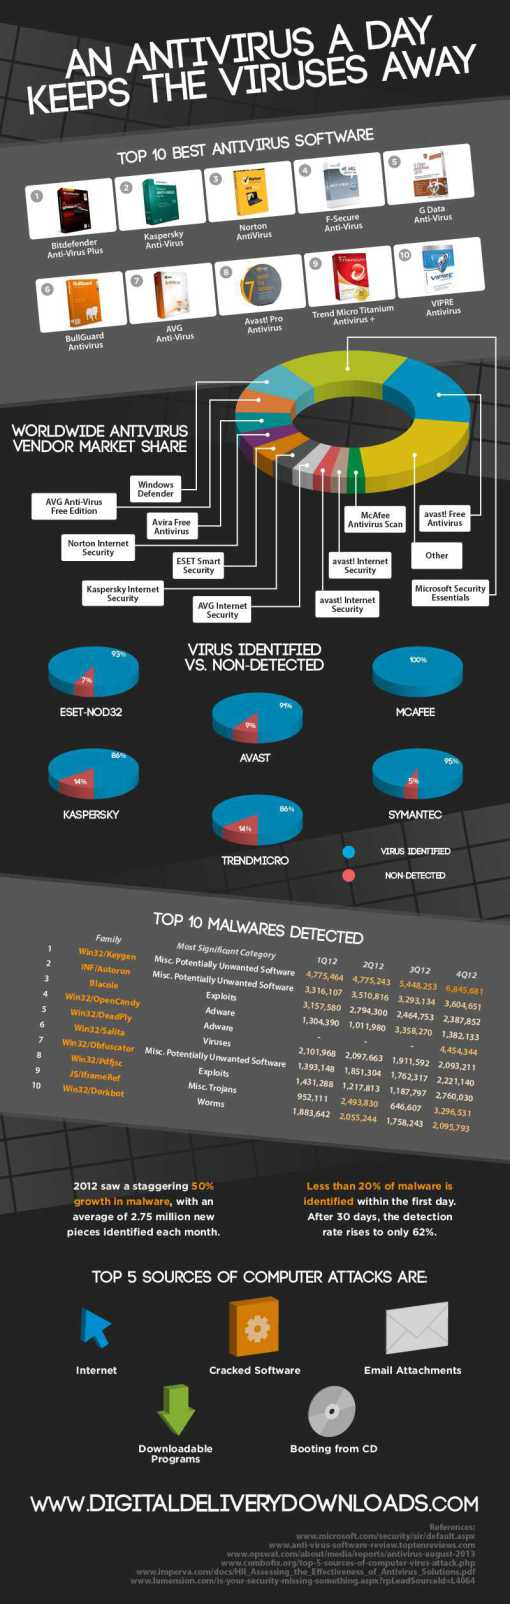 Significance Of Antivirus